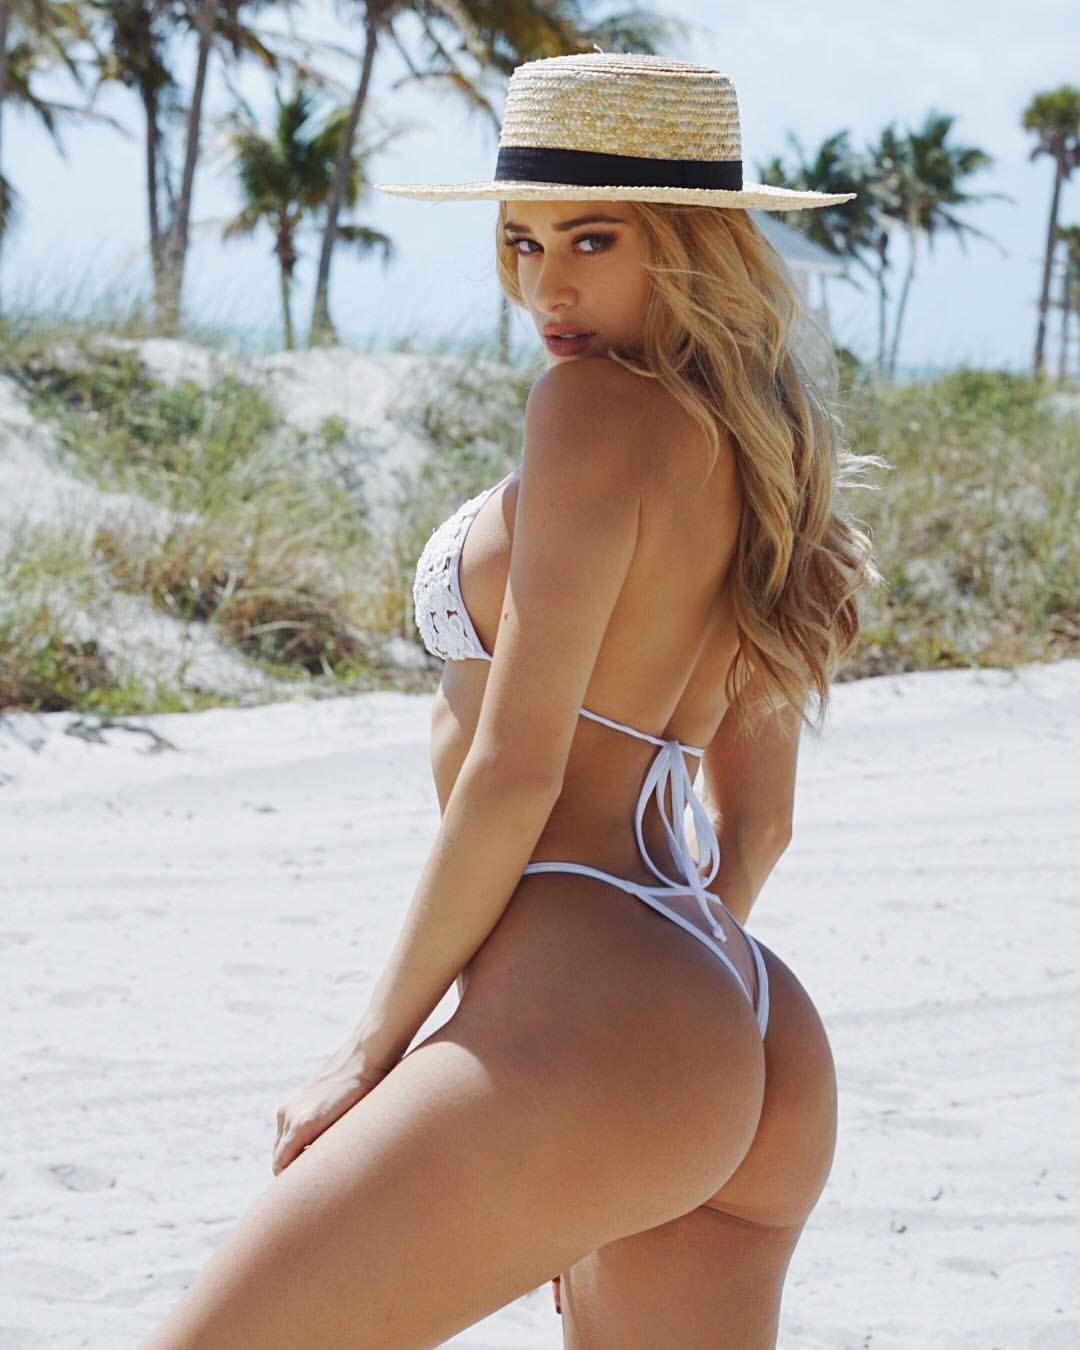 Snapchat Cindy Prado nudes (16 photos), Ass, Sideboobs, Selfie, in bikini 2020